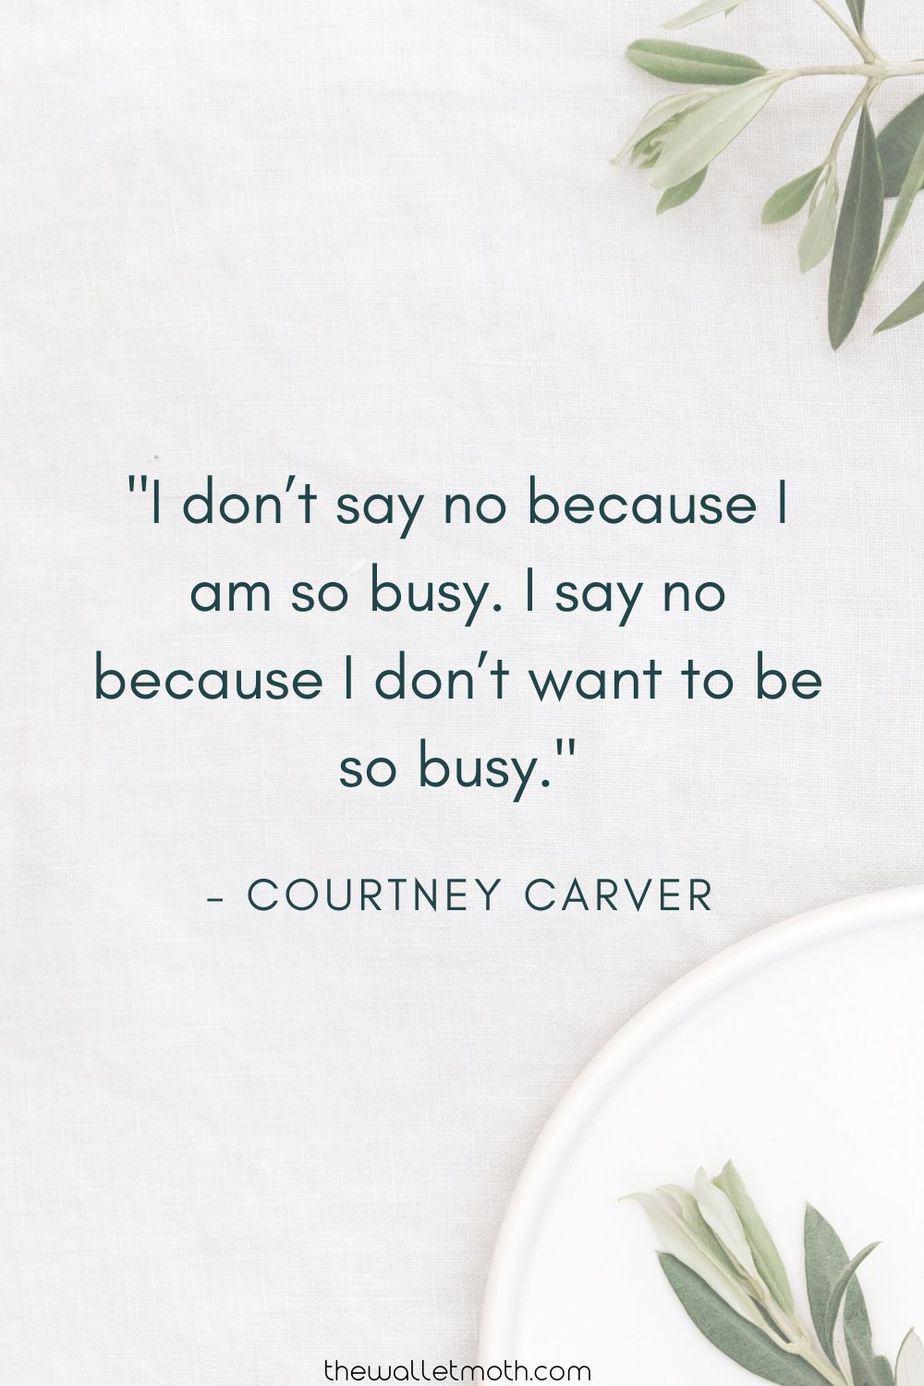 """I don't say no because I am so busy. I say no because I don't want to be so busy."" - Courtney Carver"